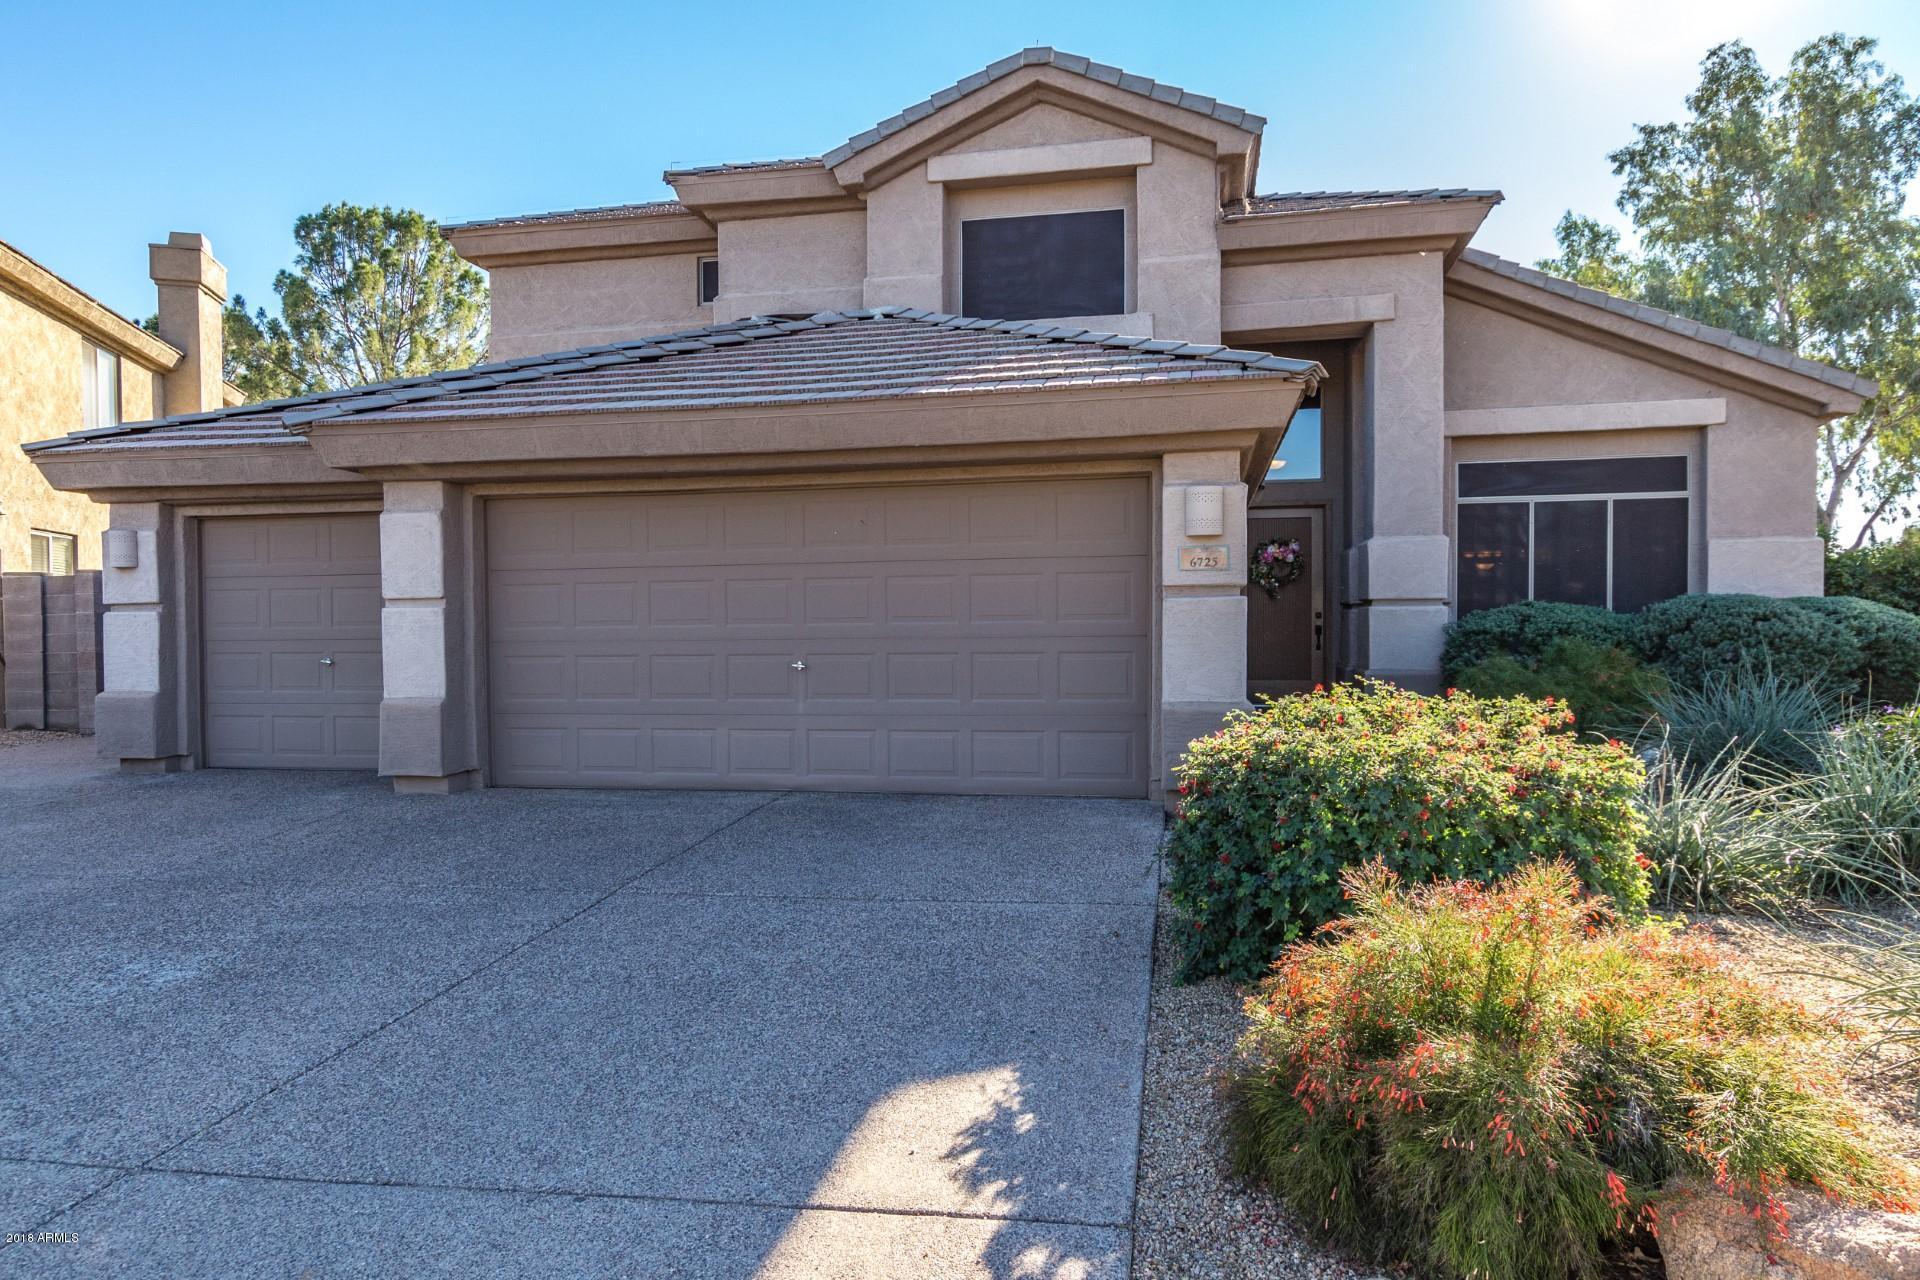 6725 E GELDING Drive, Scottsdale AZ 85254